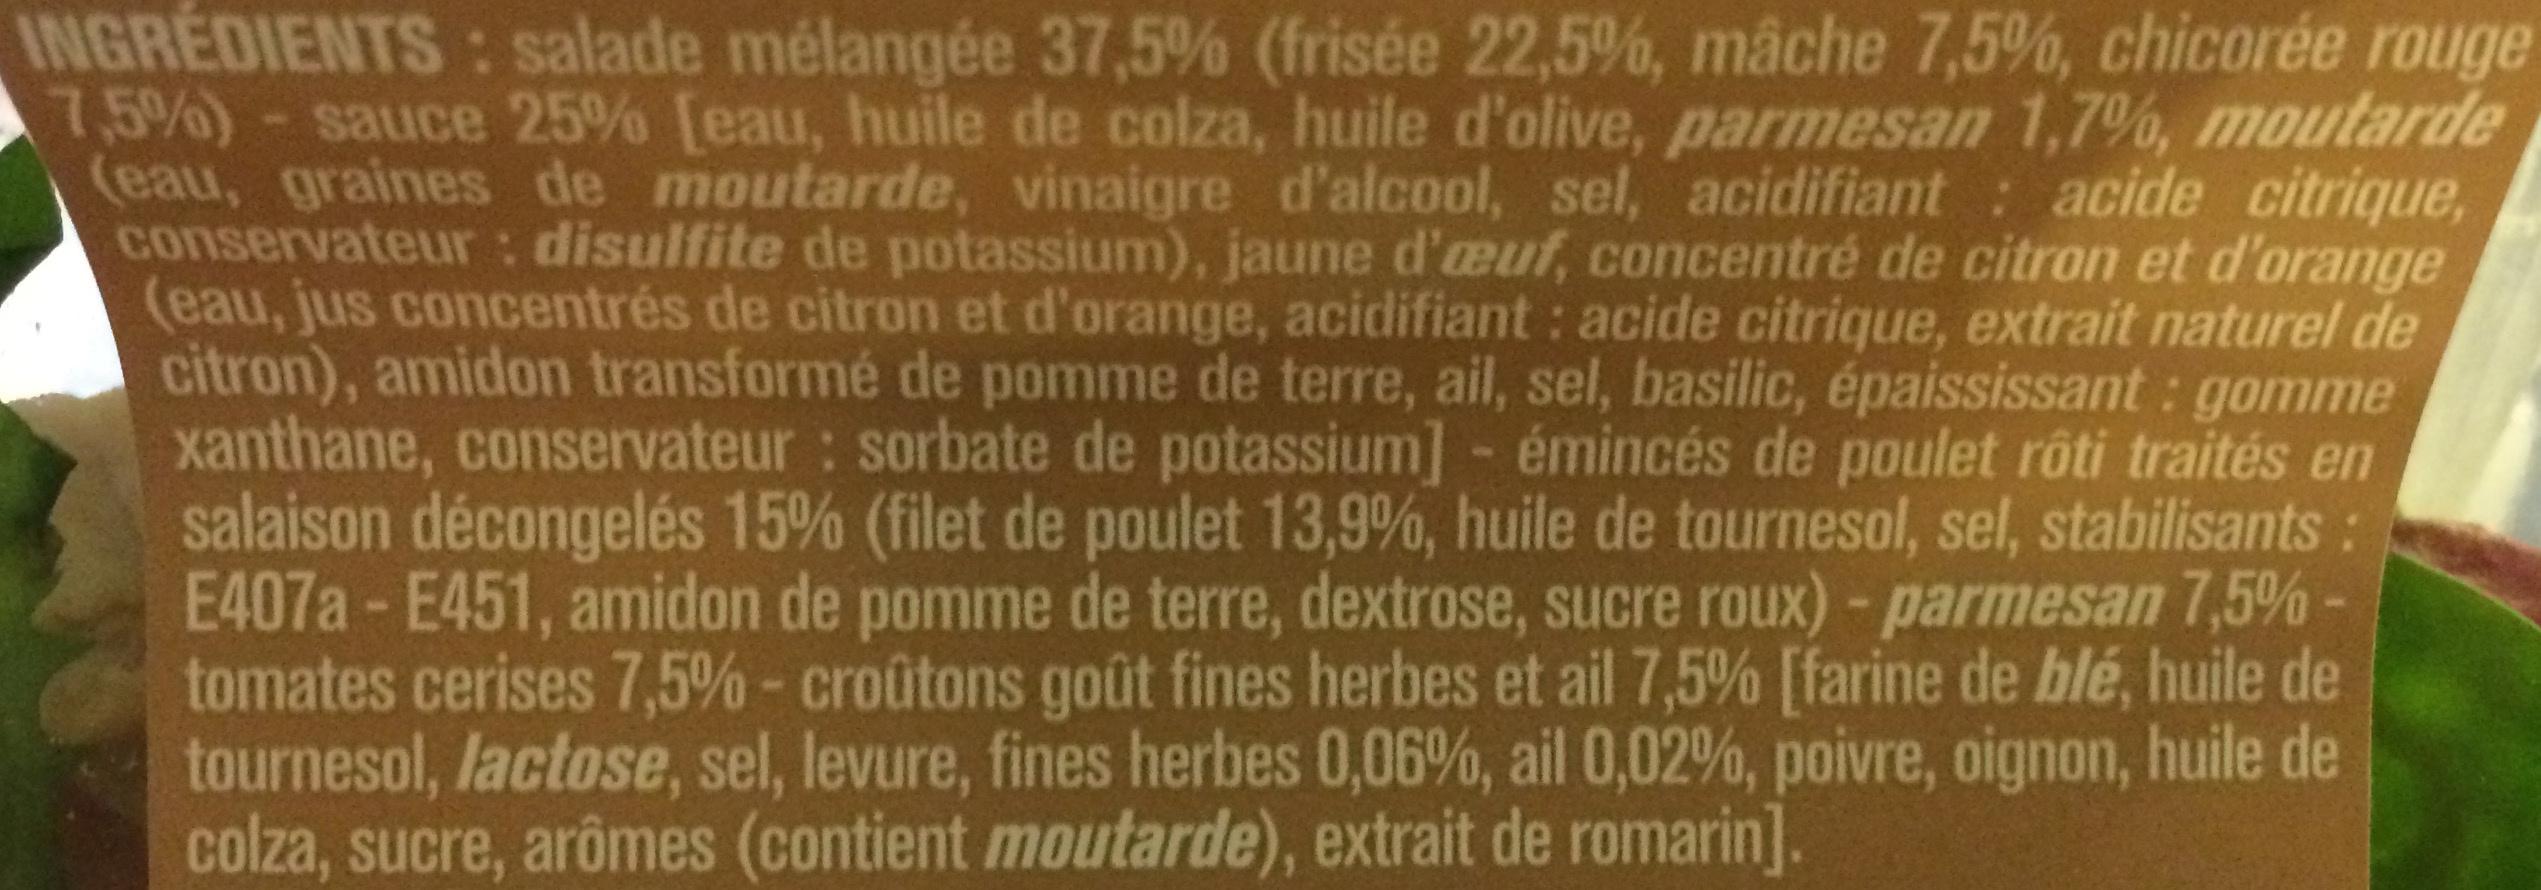 Salade Poulet, Parmesan, Croûtons, Ail et Fines Herbes, Sauce Caesar - Ingredients - fr